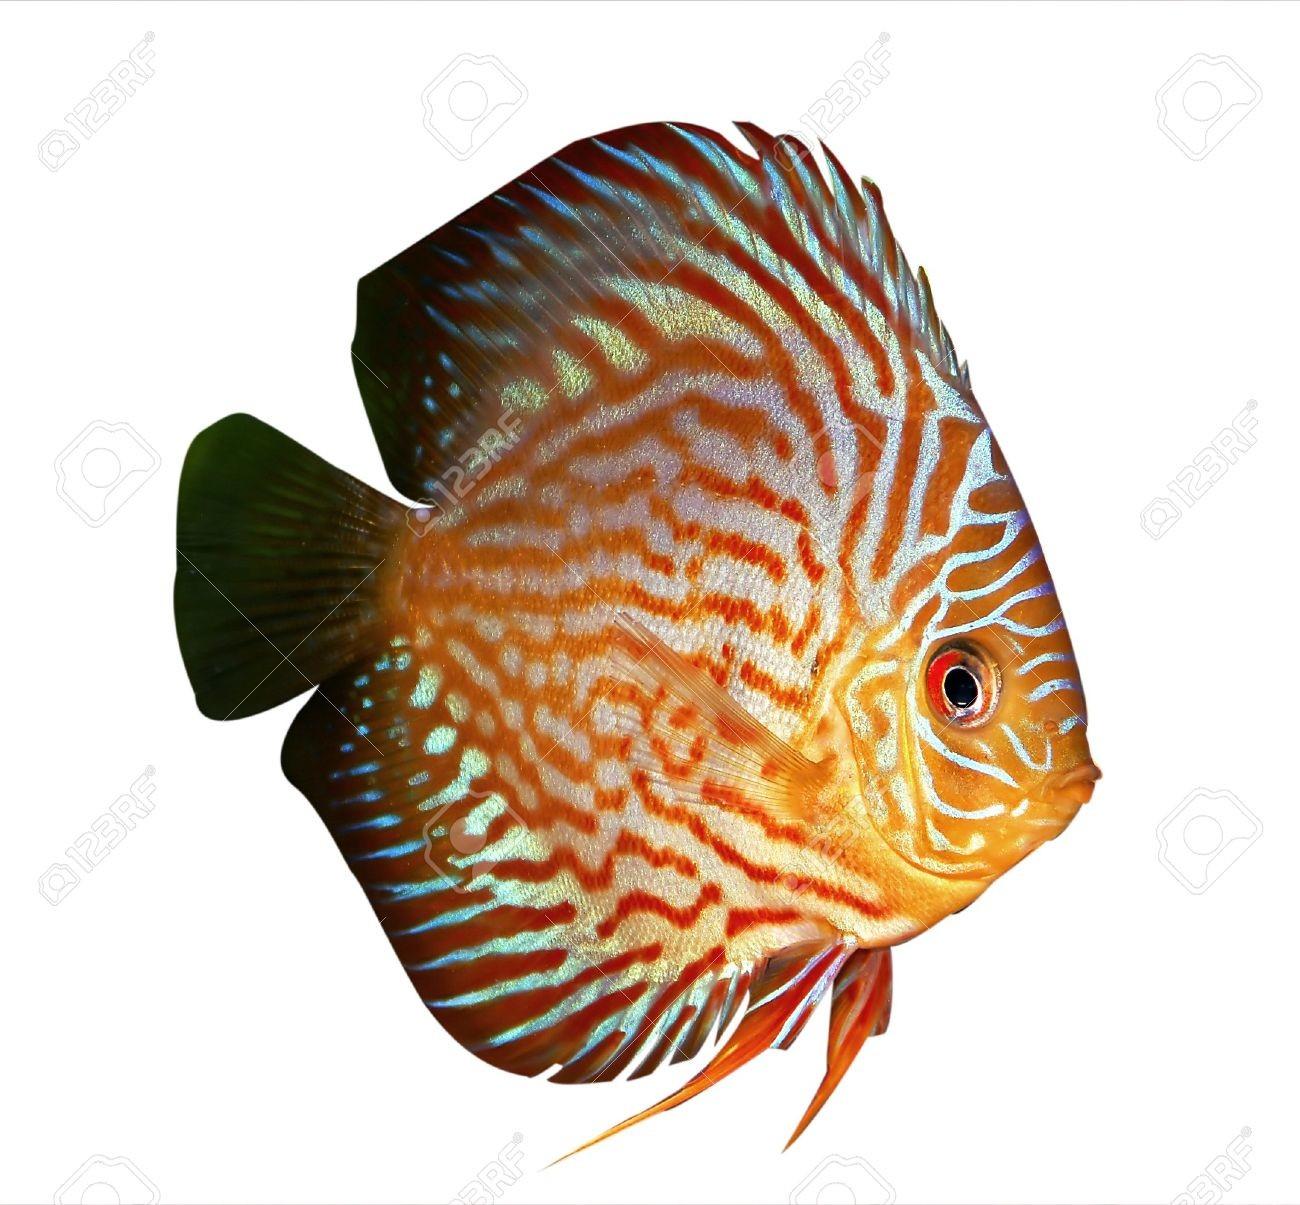 2269092 Symphysodon Discus Fish On A White Background Stock Photo